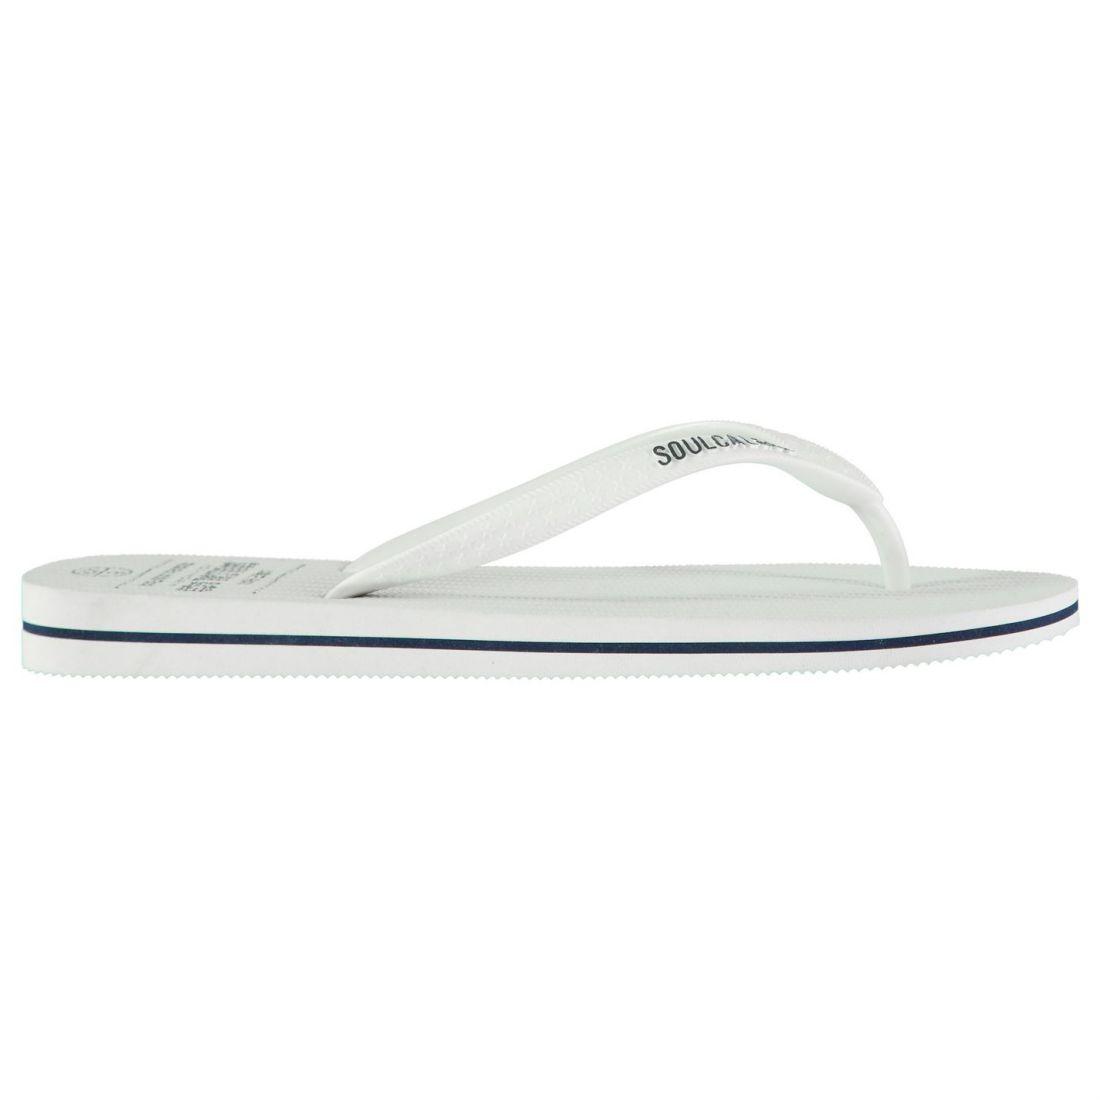 659acacba SoulCal Maui Flip Flops Mens Gents Slip On Lightweight Toe Post